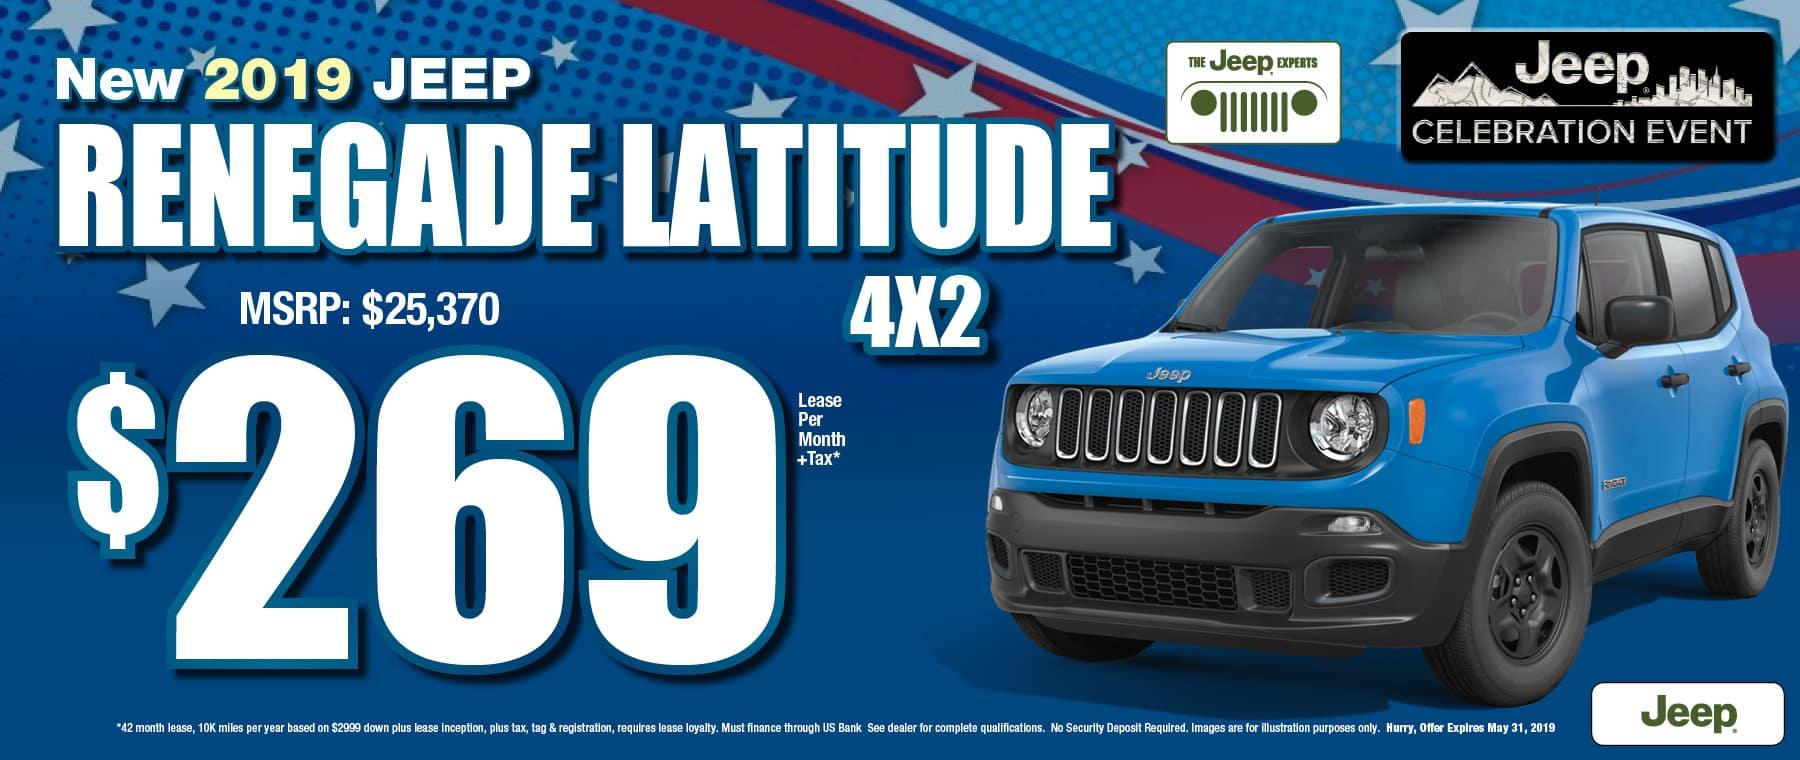 Renegade $269 Lease